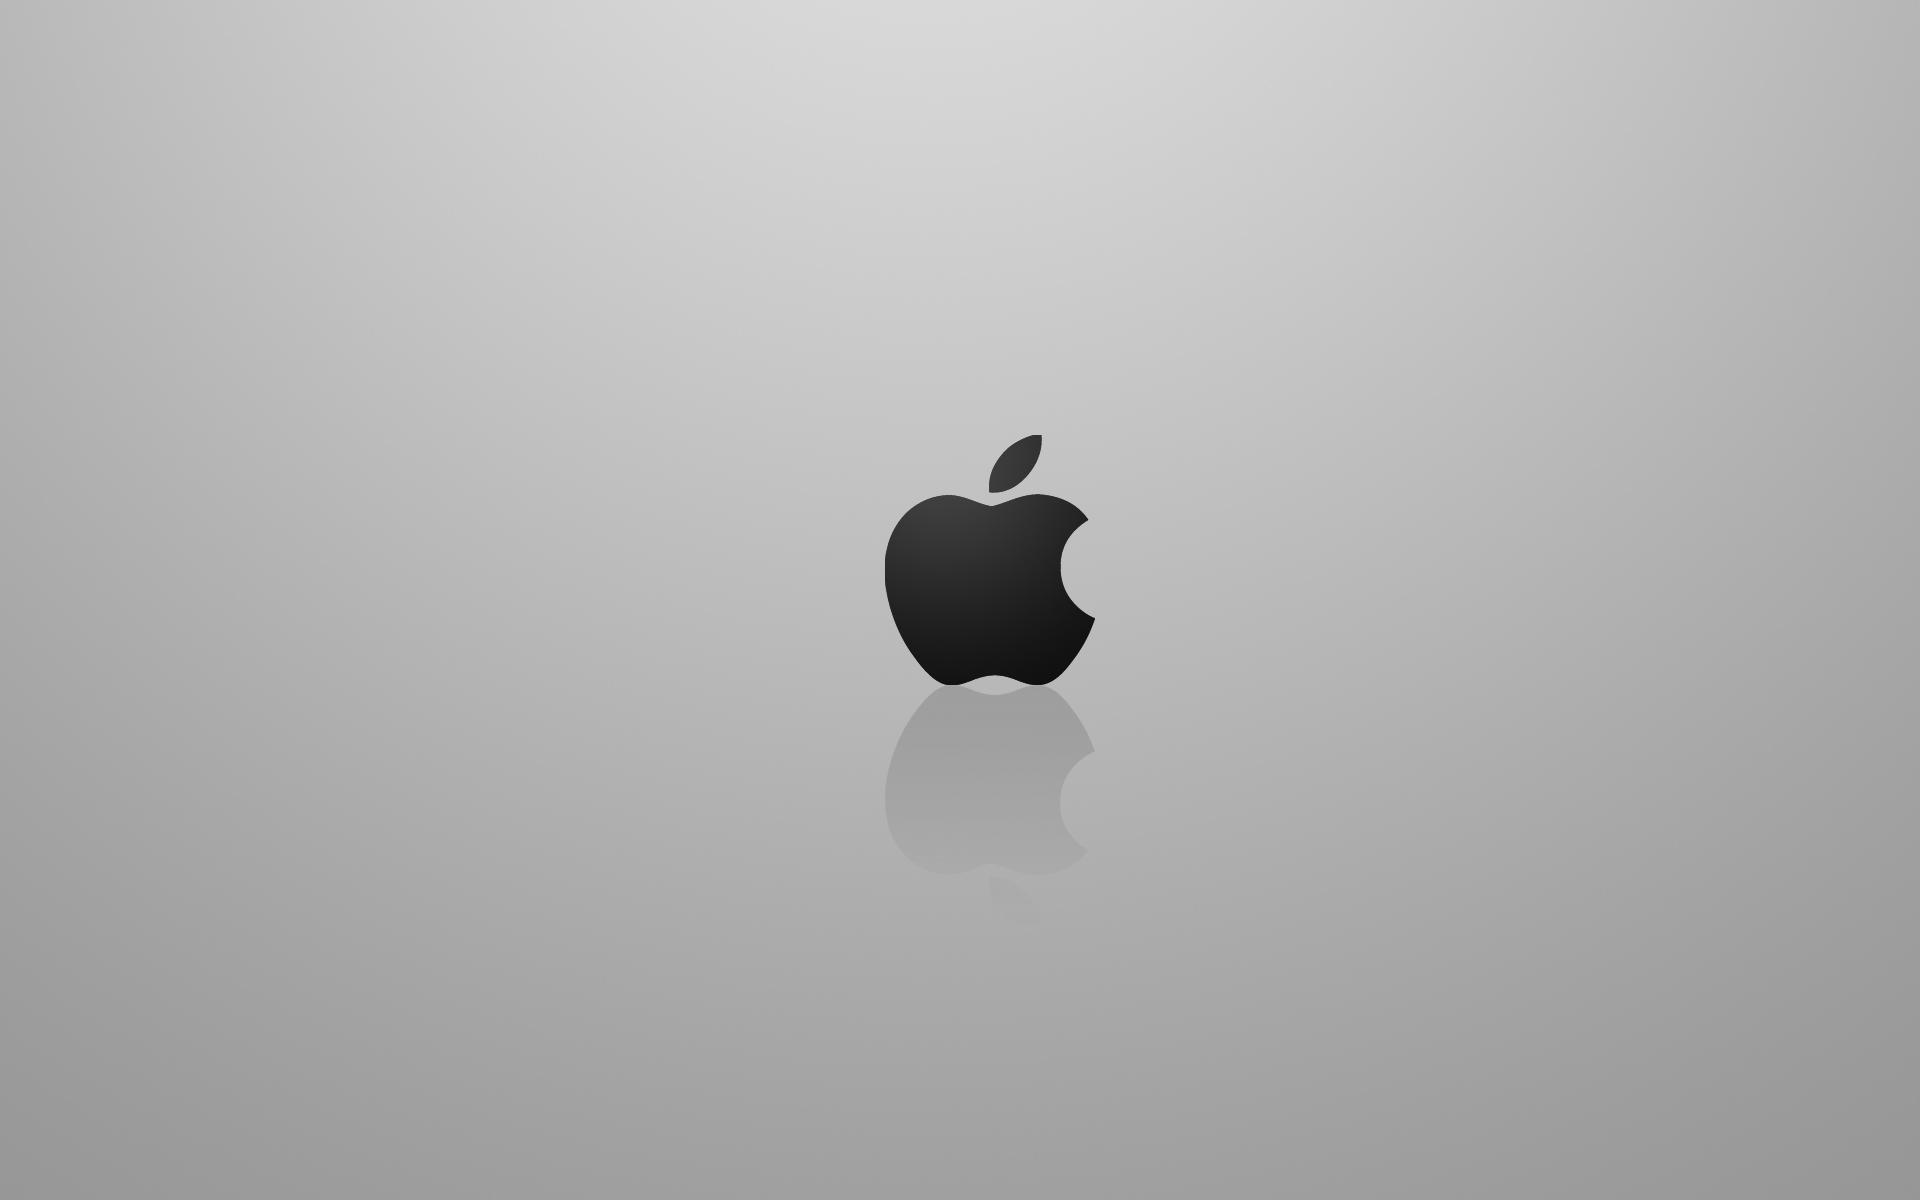 Apple Creeper Wallpaper